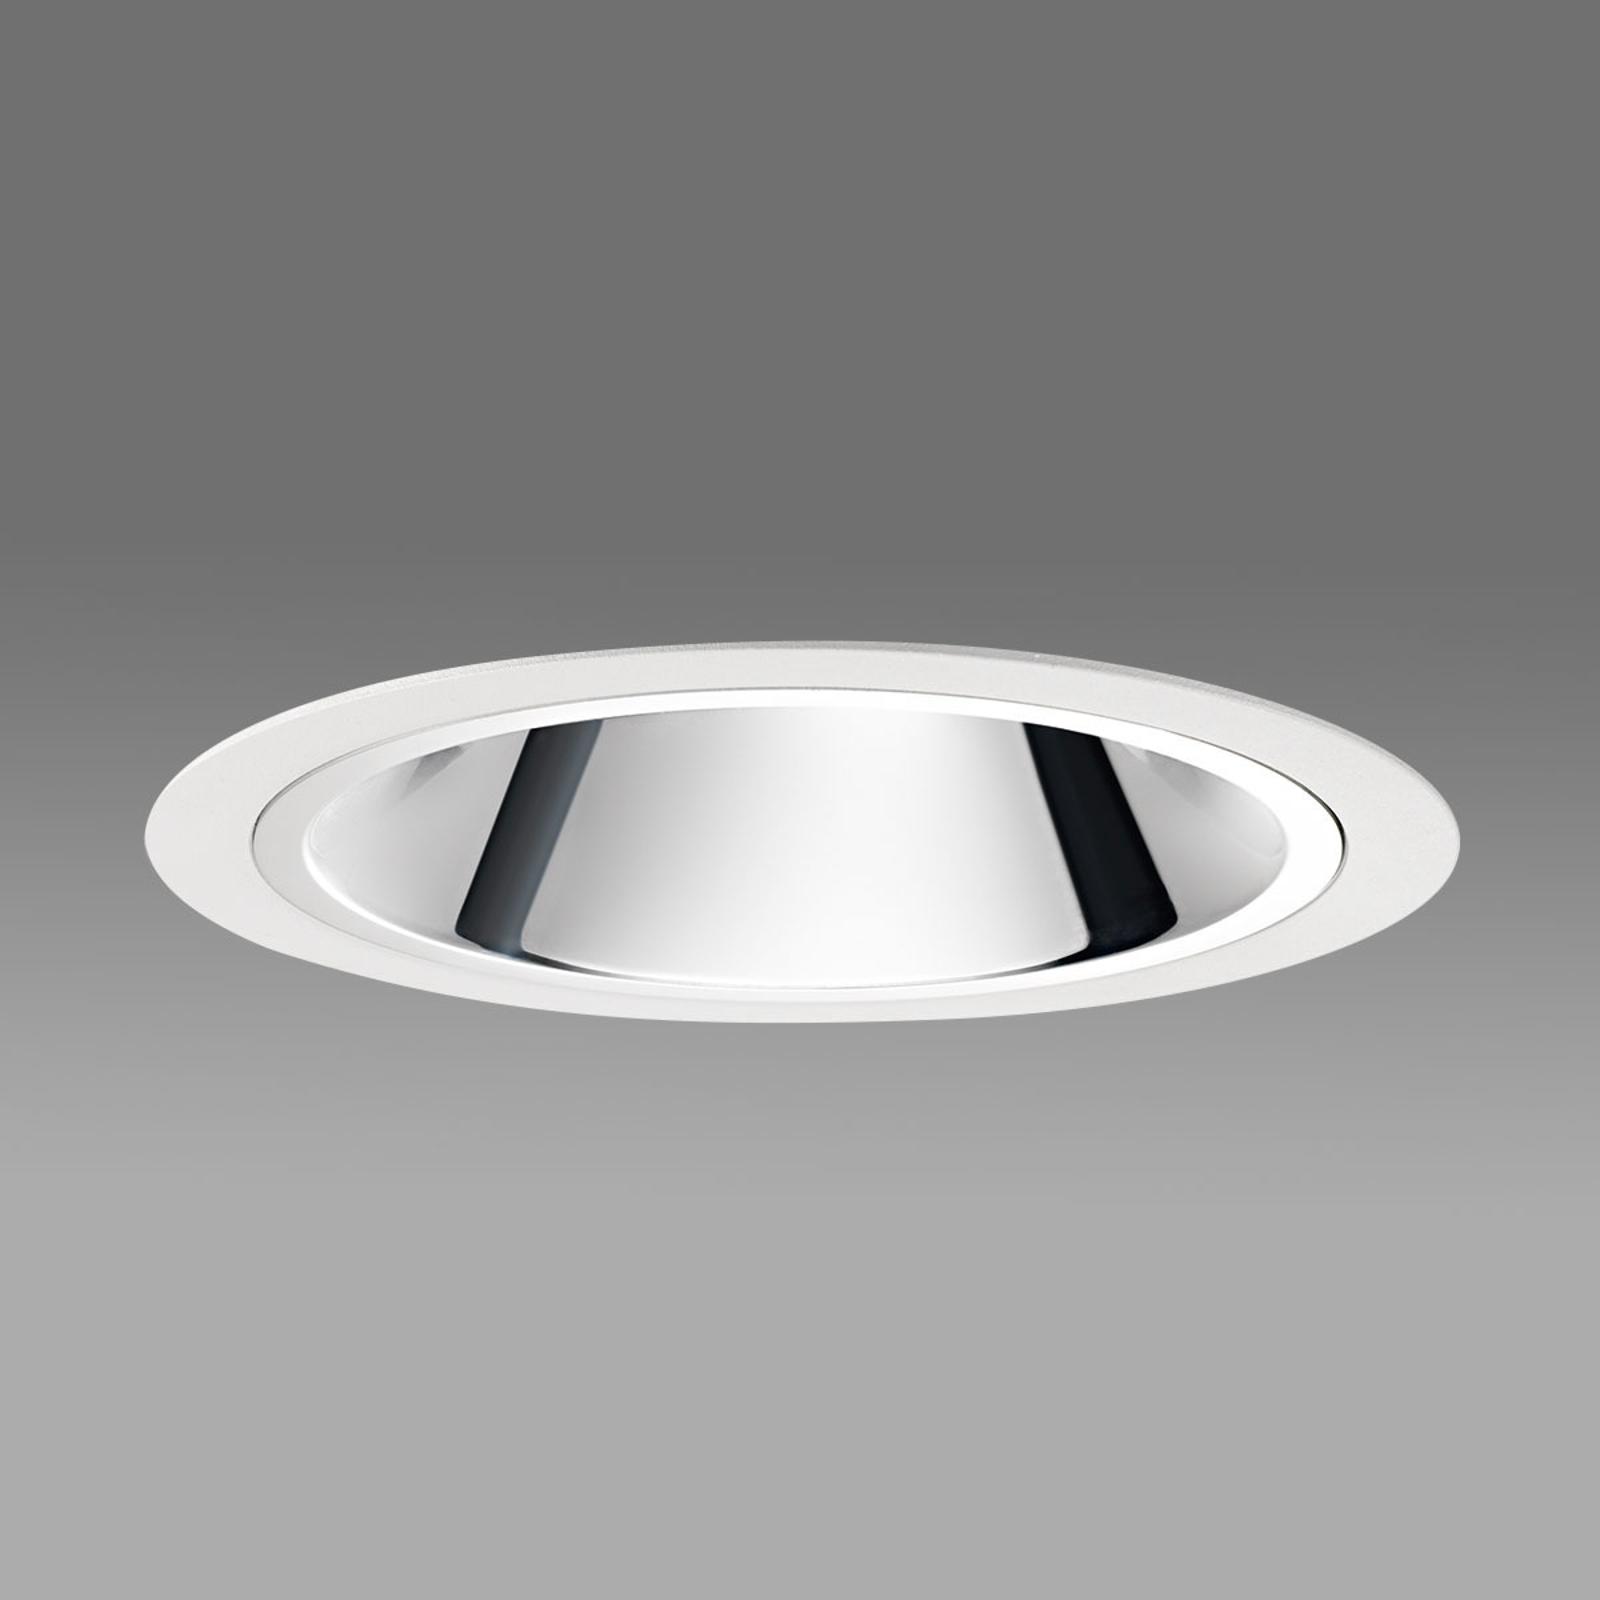 Lampada LED da incasso Centro - emissione 69°